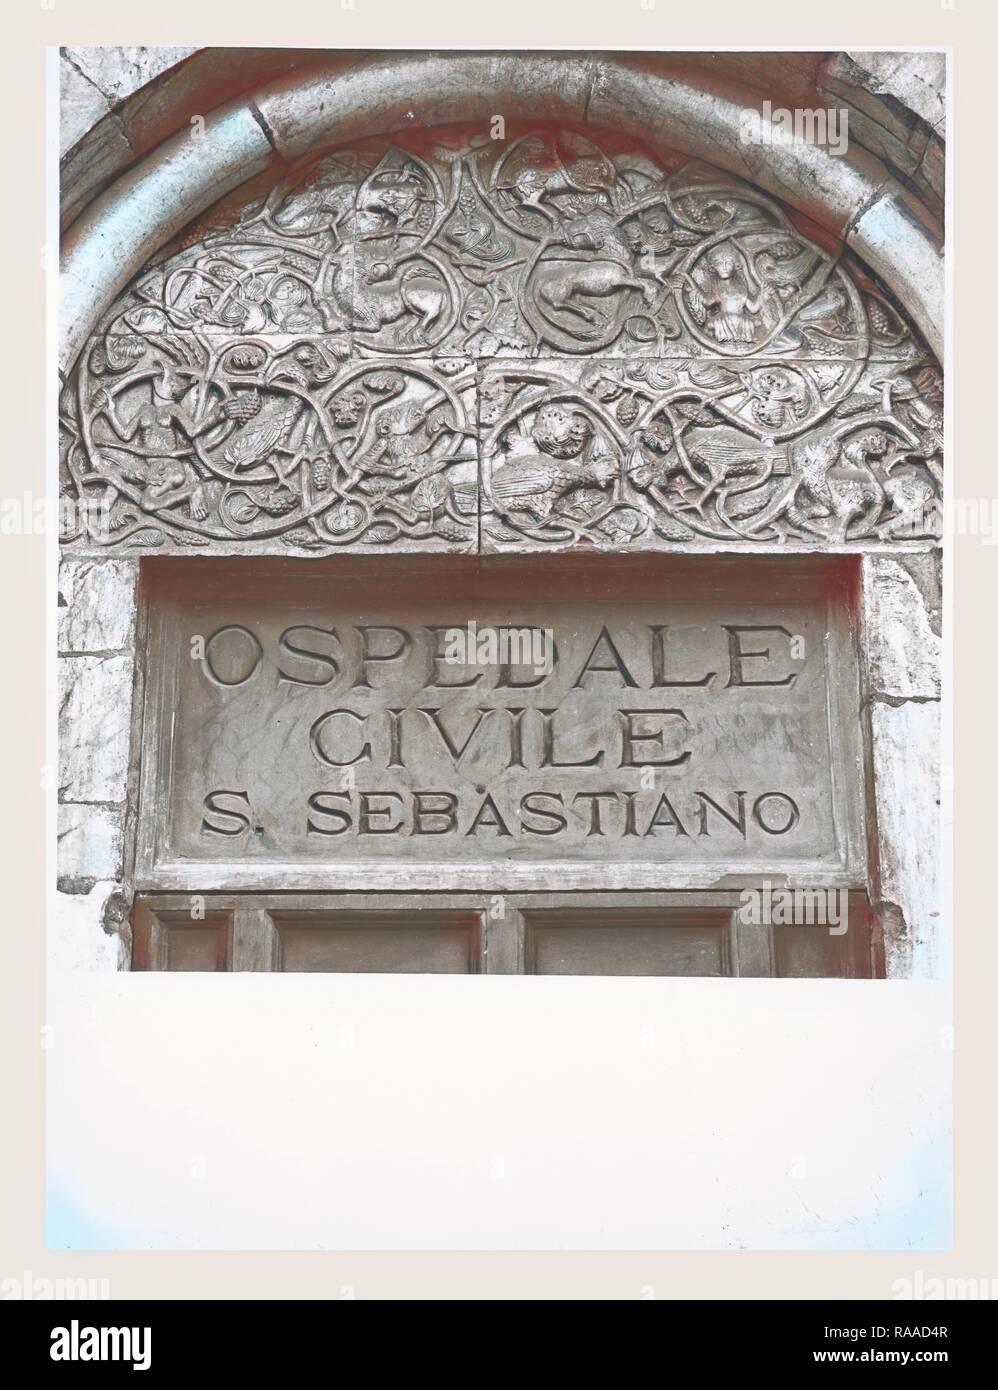 Lazio Viterbo Capranica portale romanico, this is my Italy, the italian country of visual history, Medieval reimagined - Stock Image